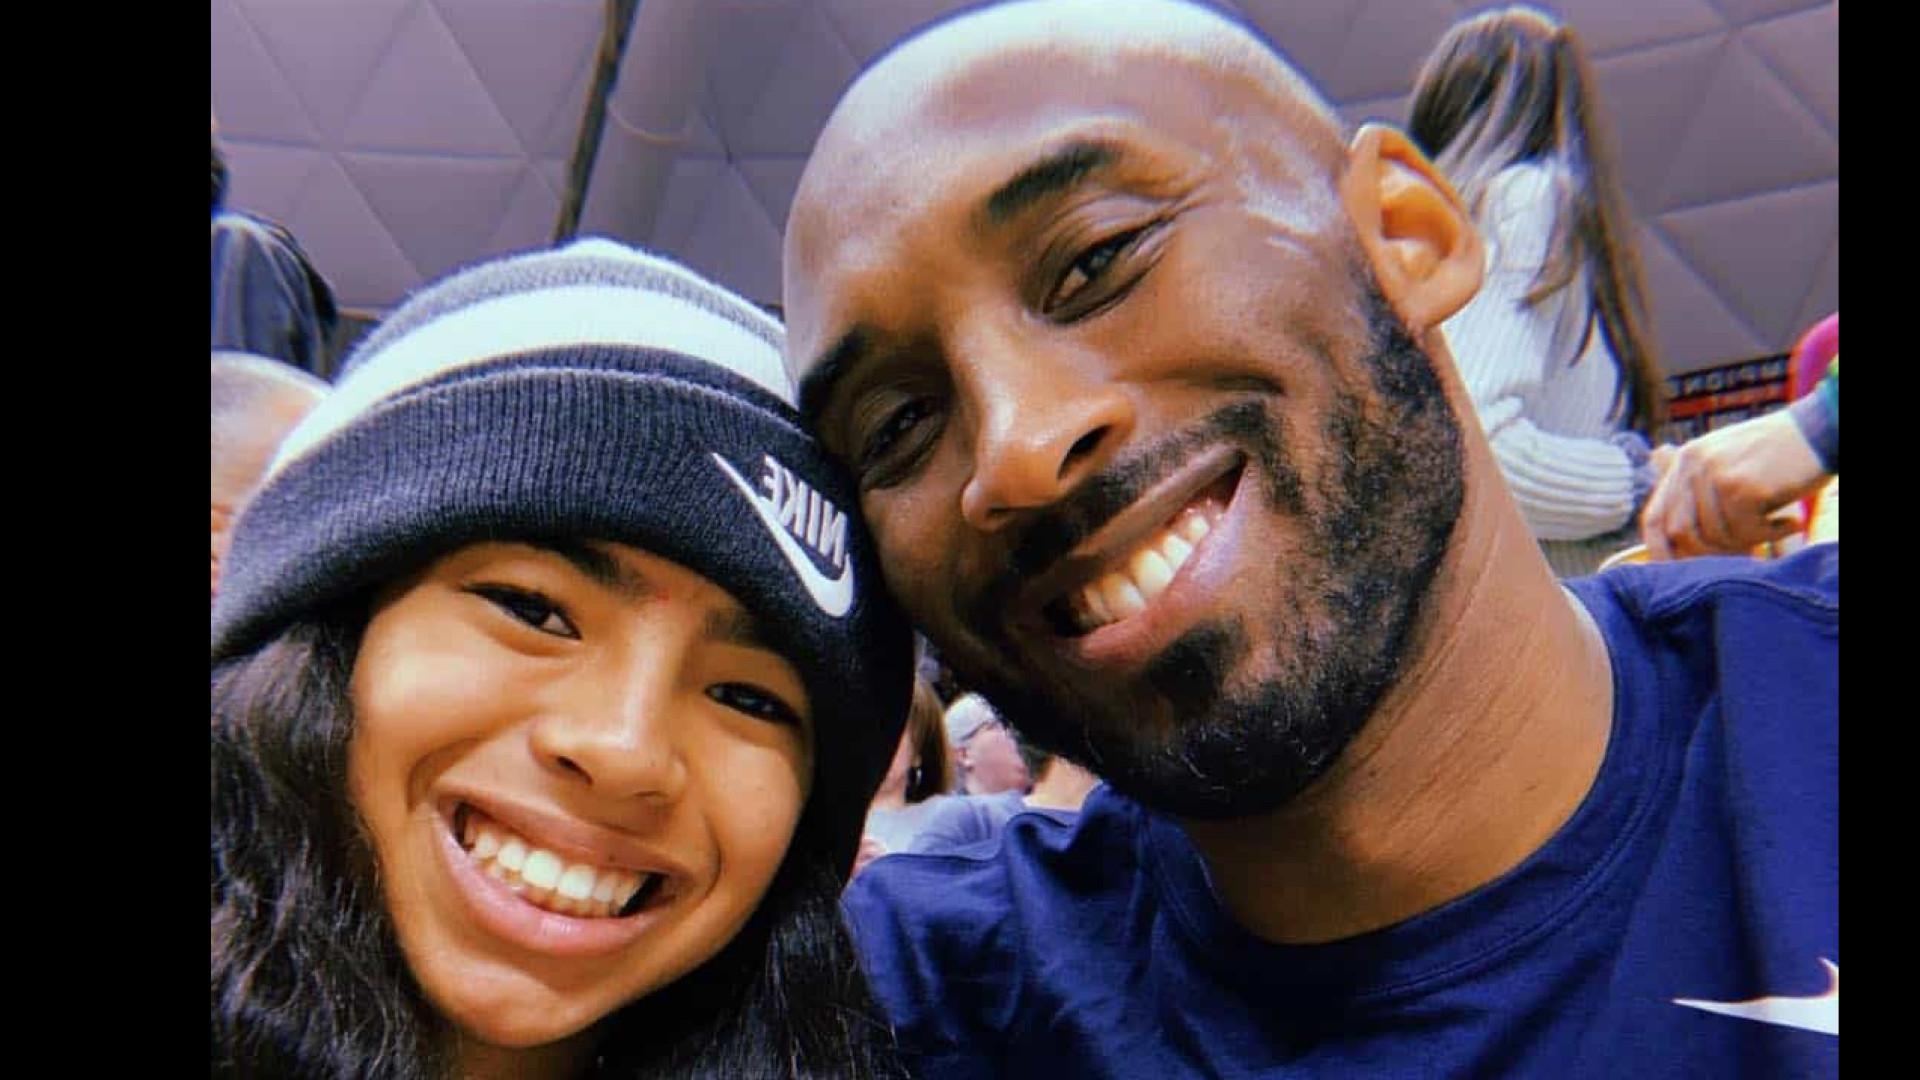 Funeral de Bryant será dia 24, aberto ao público e na casa dos Lakers